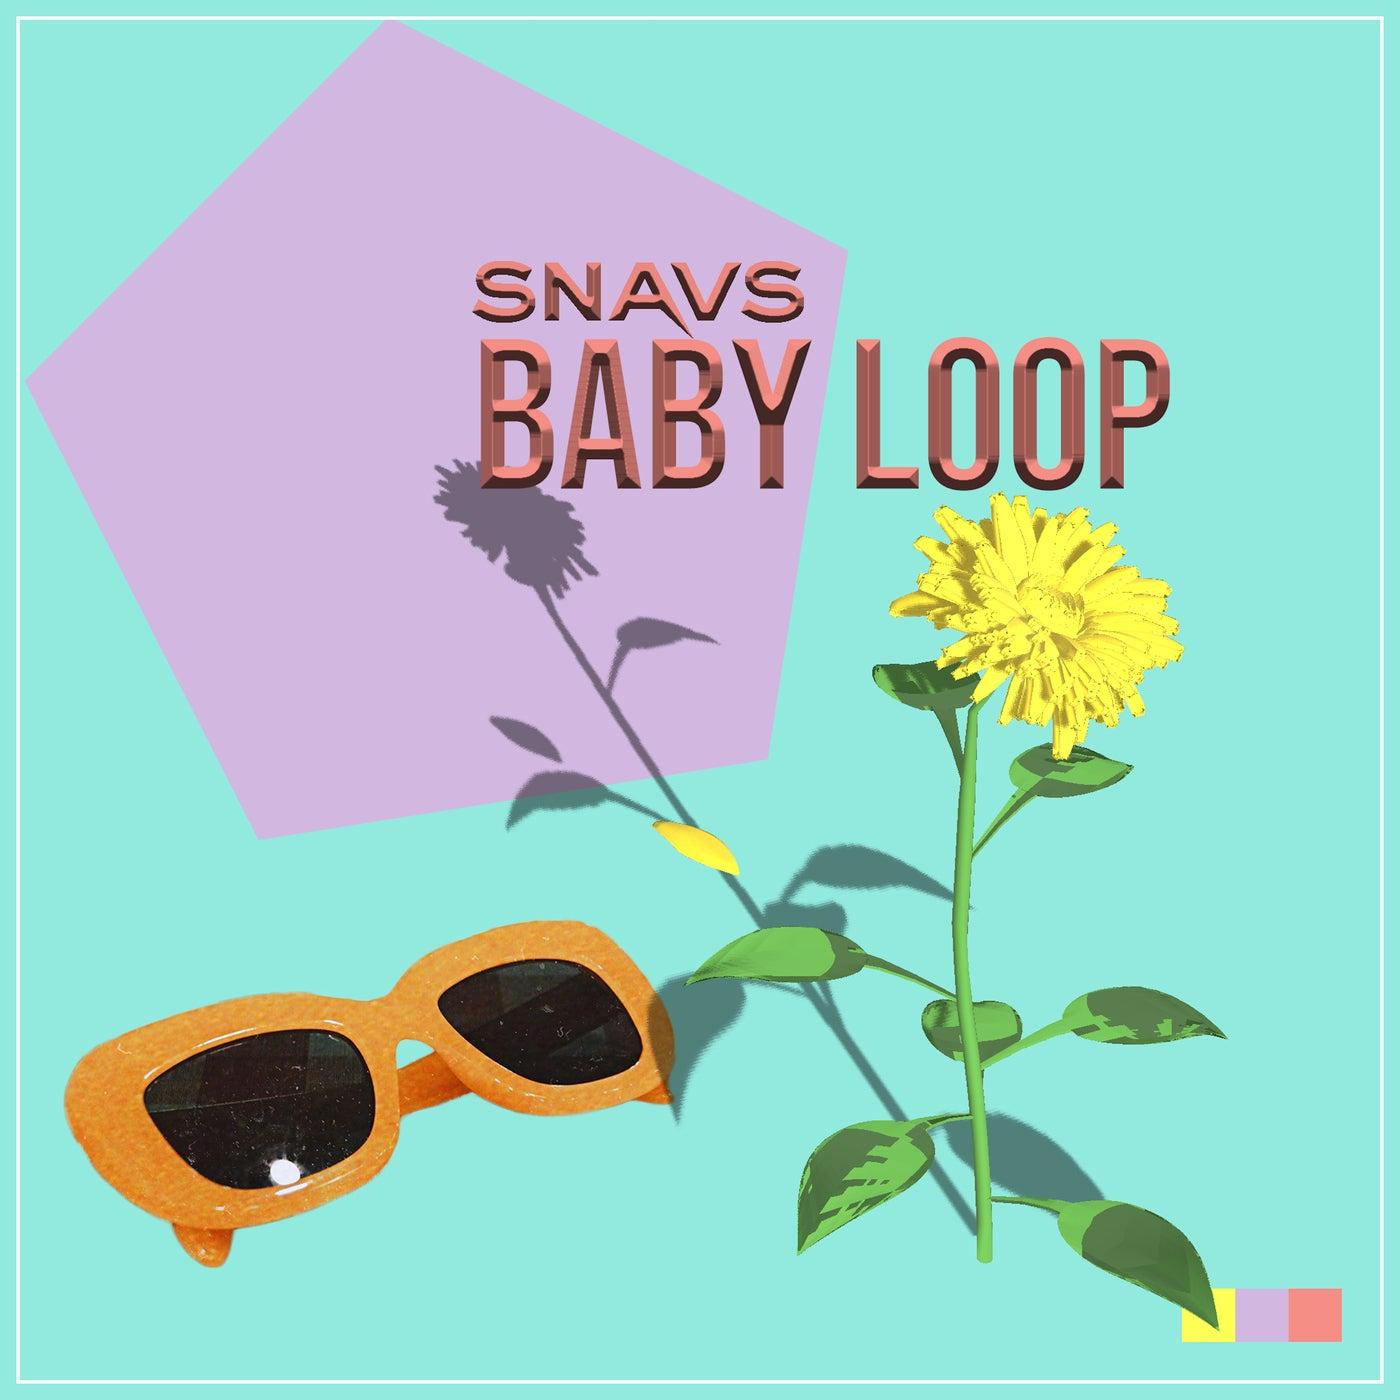 Baby Loop (Original Mix)